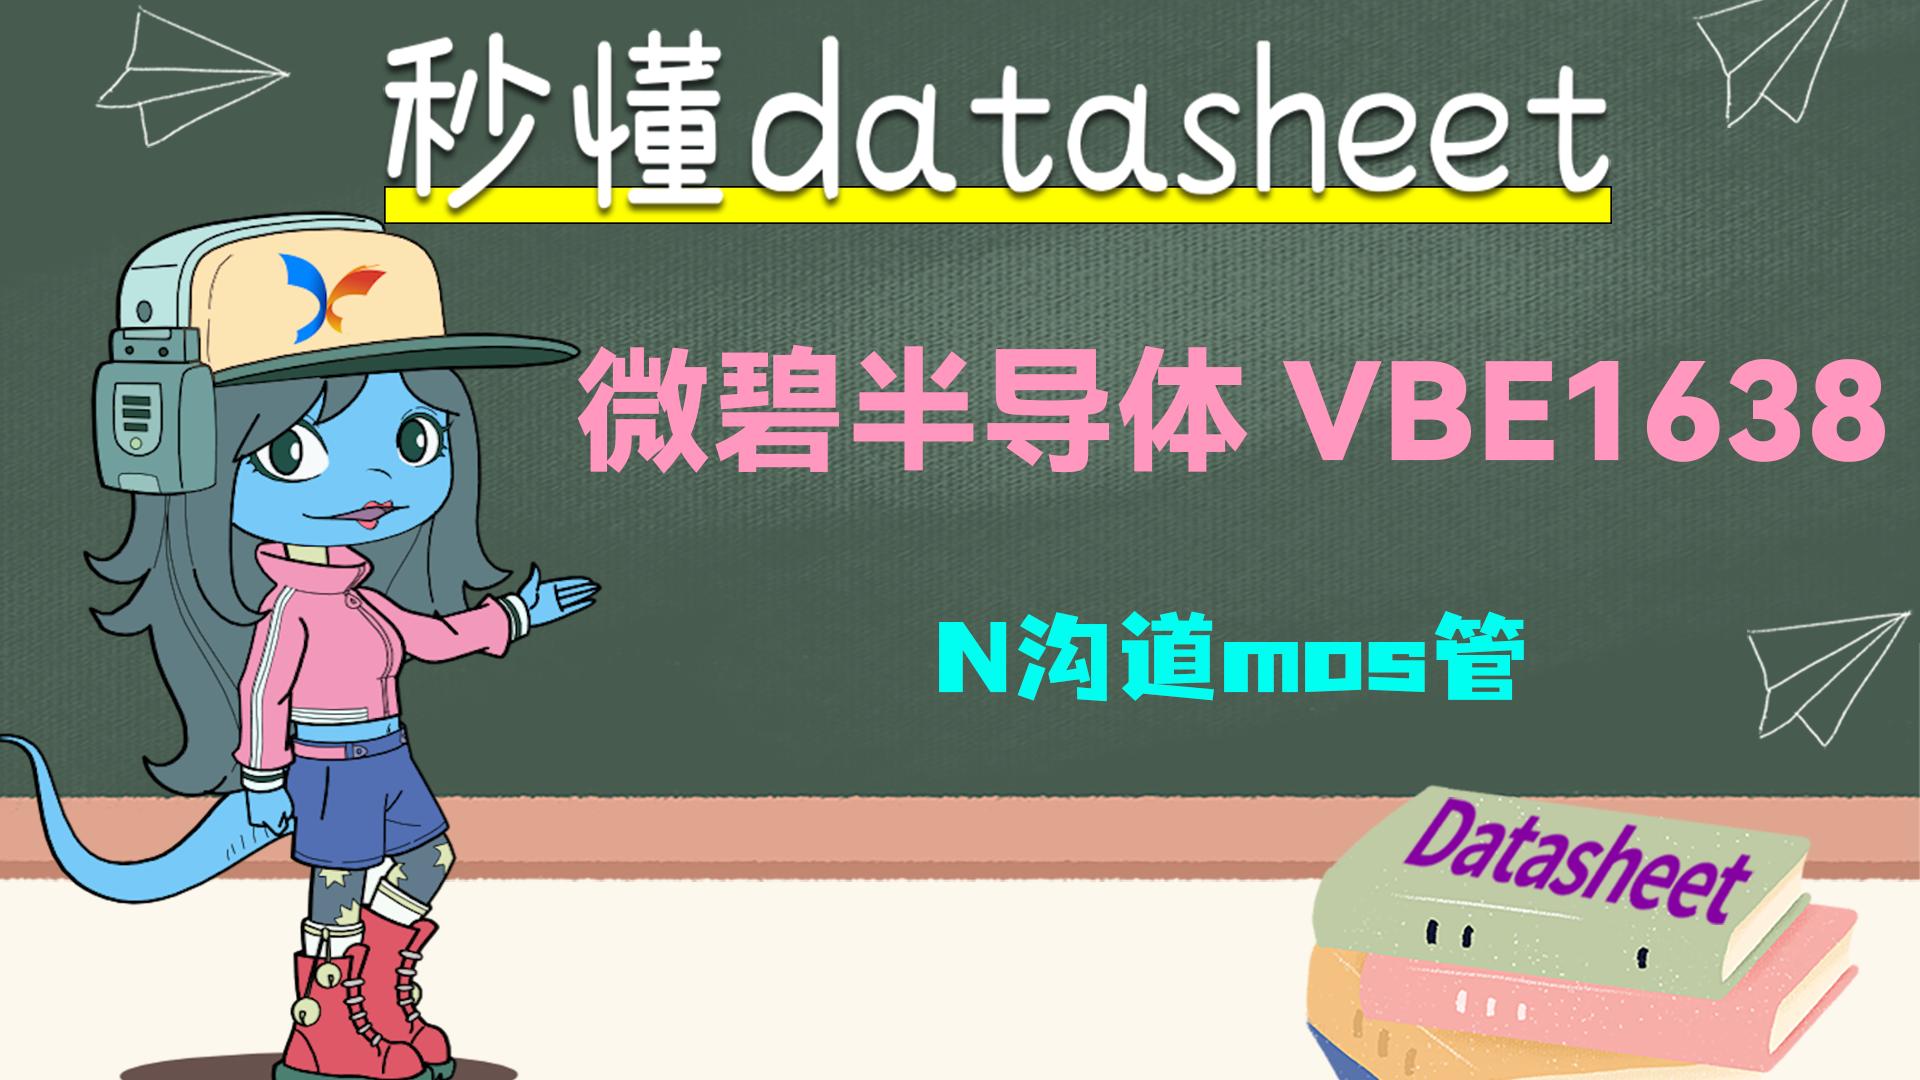 【秒懂datasheet】微碧VBE1638-N沟道mos管